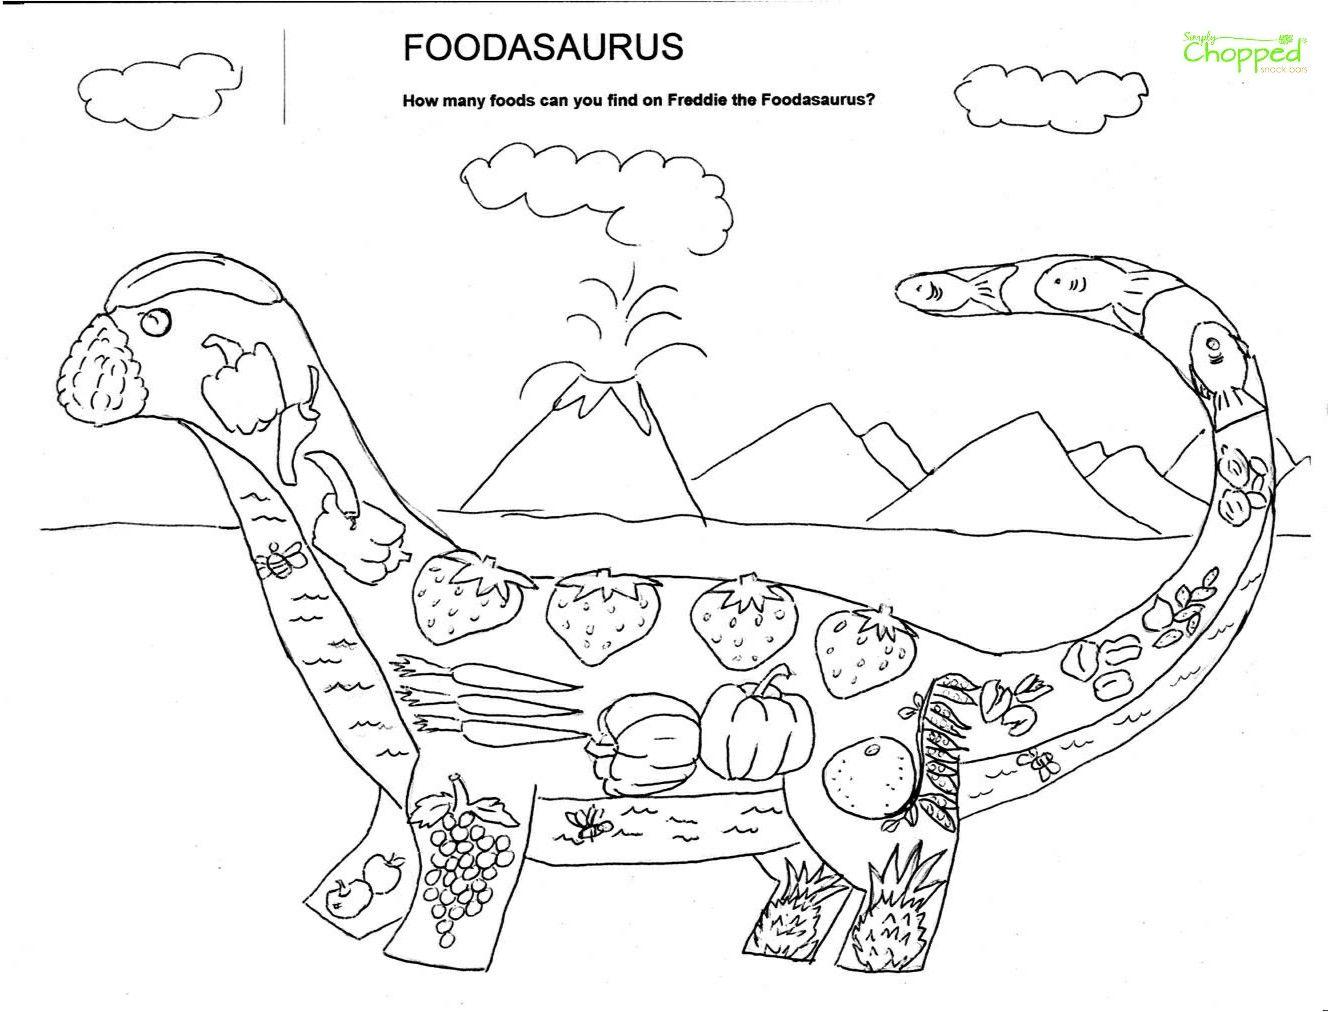 Foodasaurus Local Georgia Artist Sheila Sullivan Created These Unique Wonderful Coloring P Food Coloring Pages Dinosaur Coloring Pages Fruit Coloring Pages